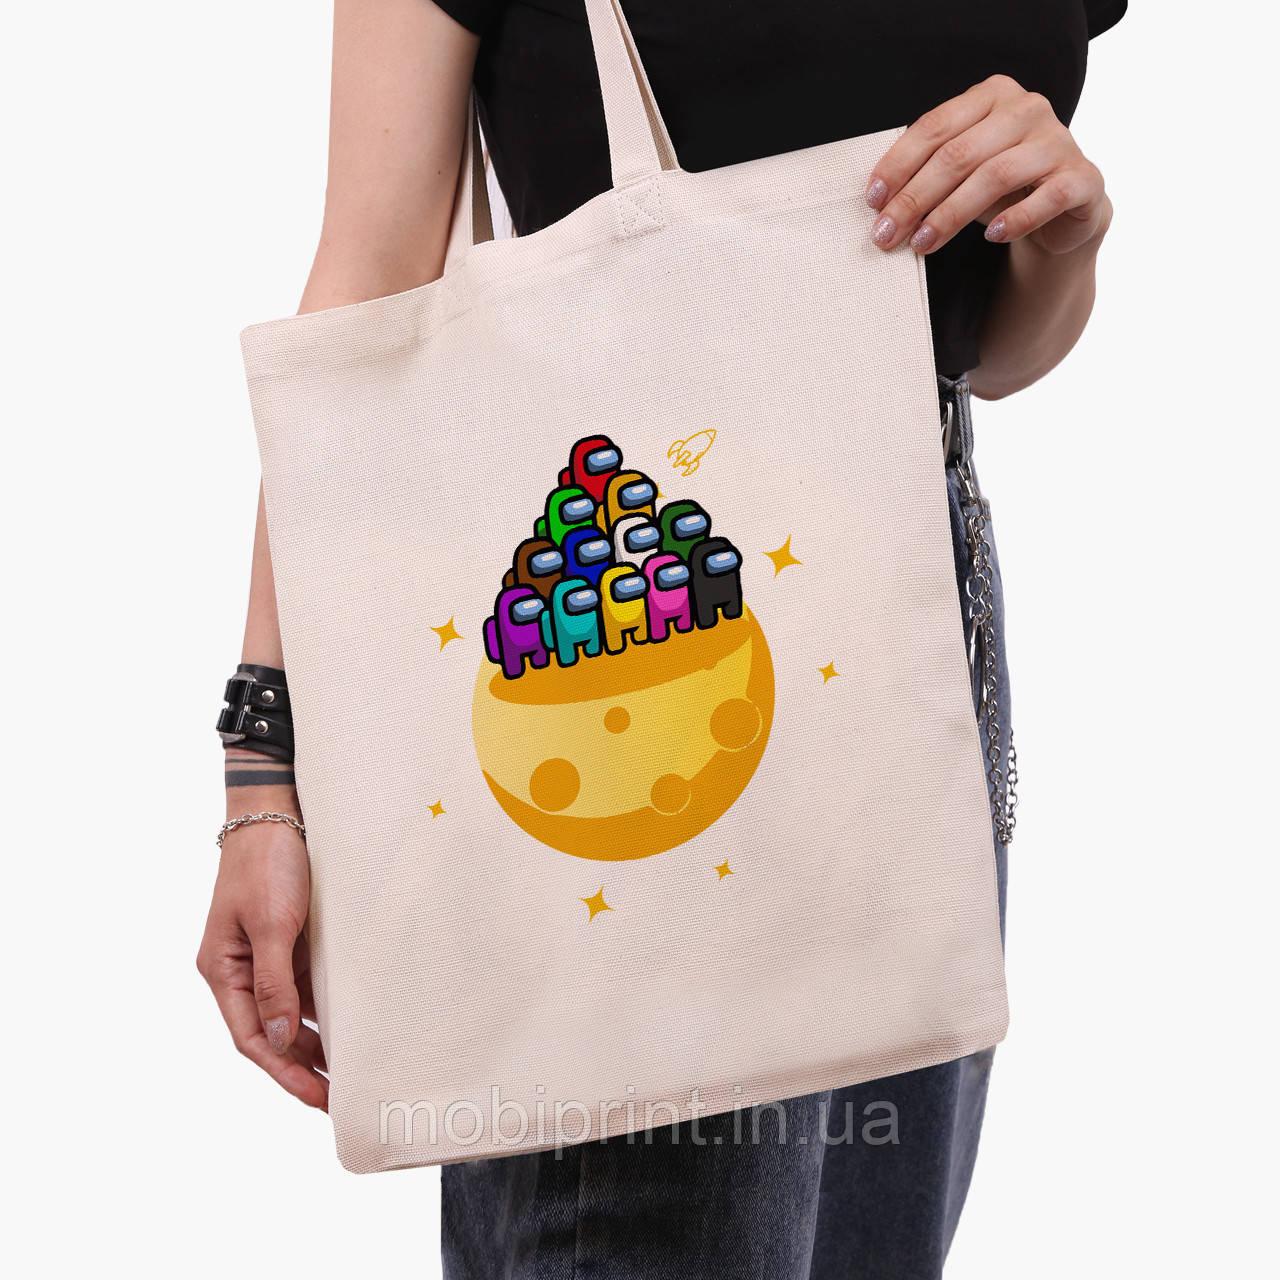 Еко сумка шоппер Амонг Ас (Among Us) (9227-2584) 41*35 см